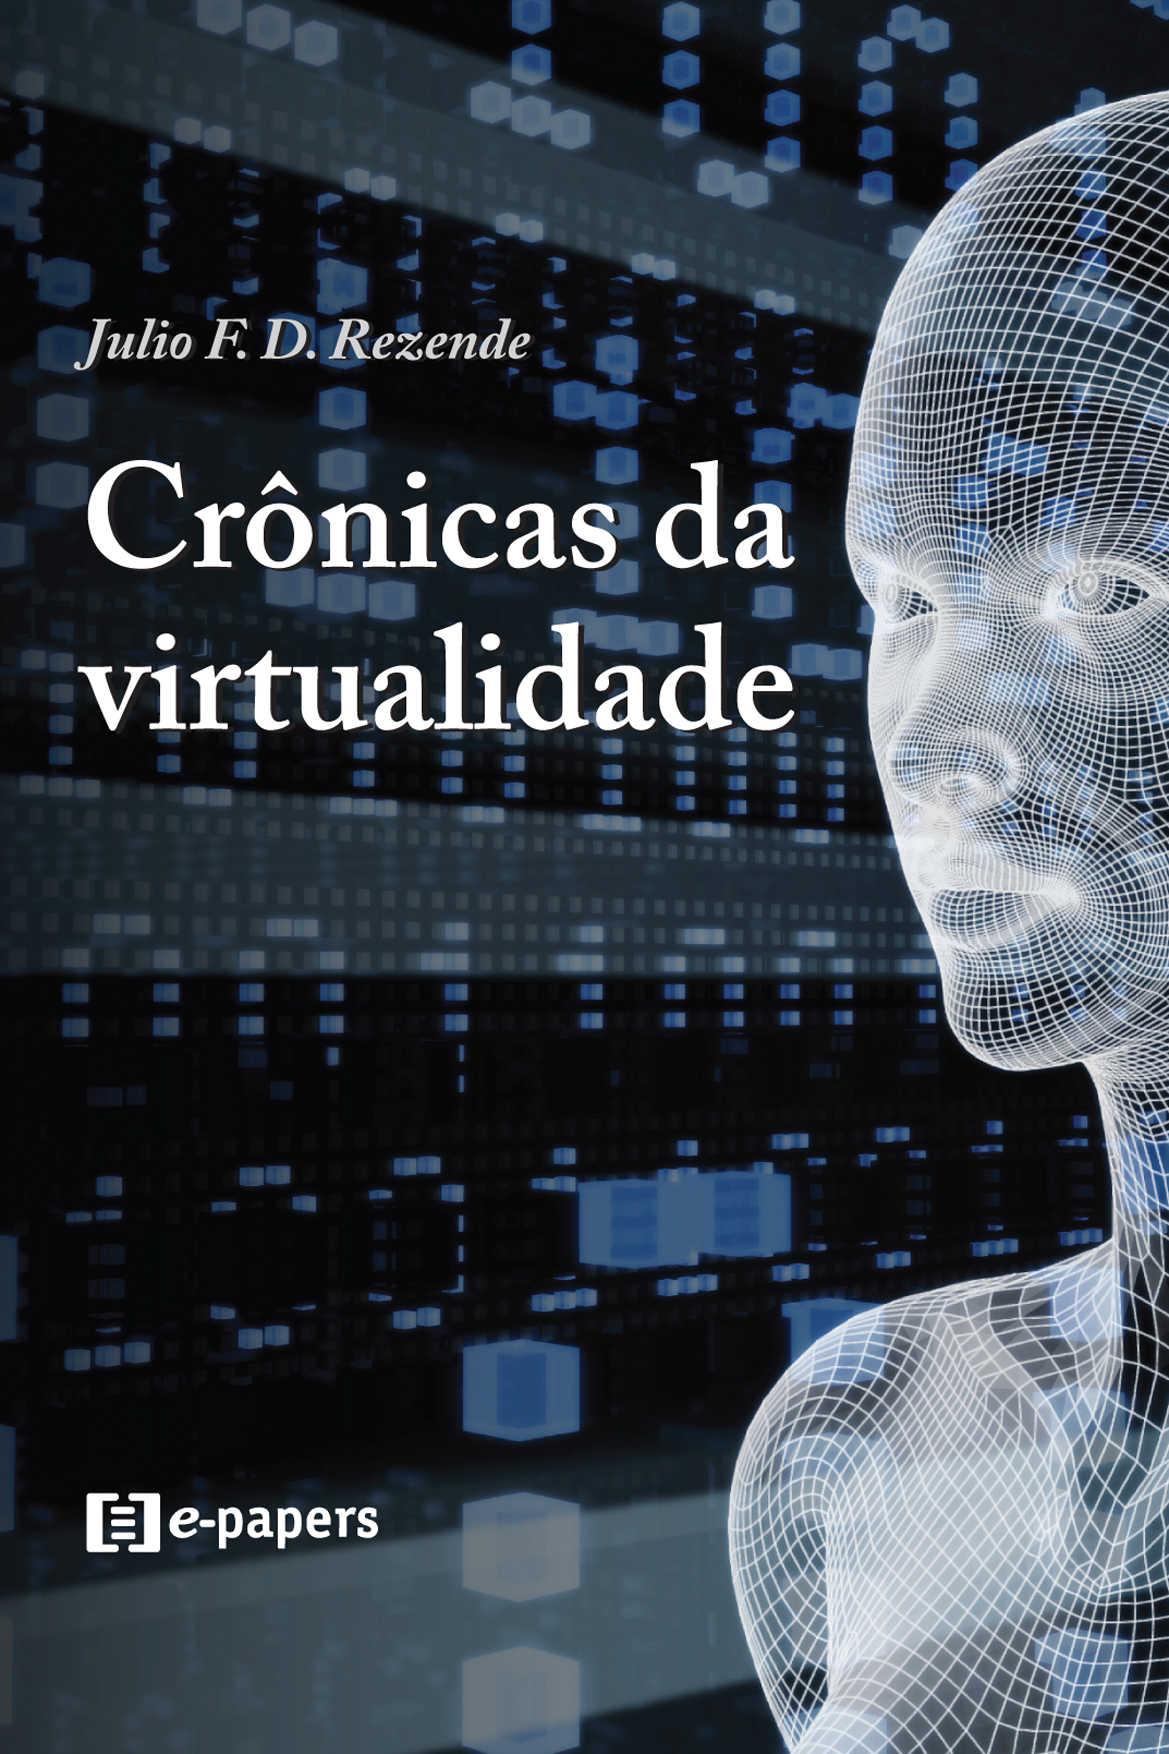 Crônicas da virtualidade